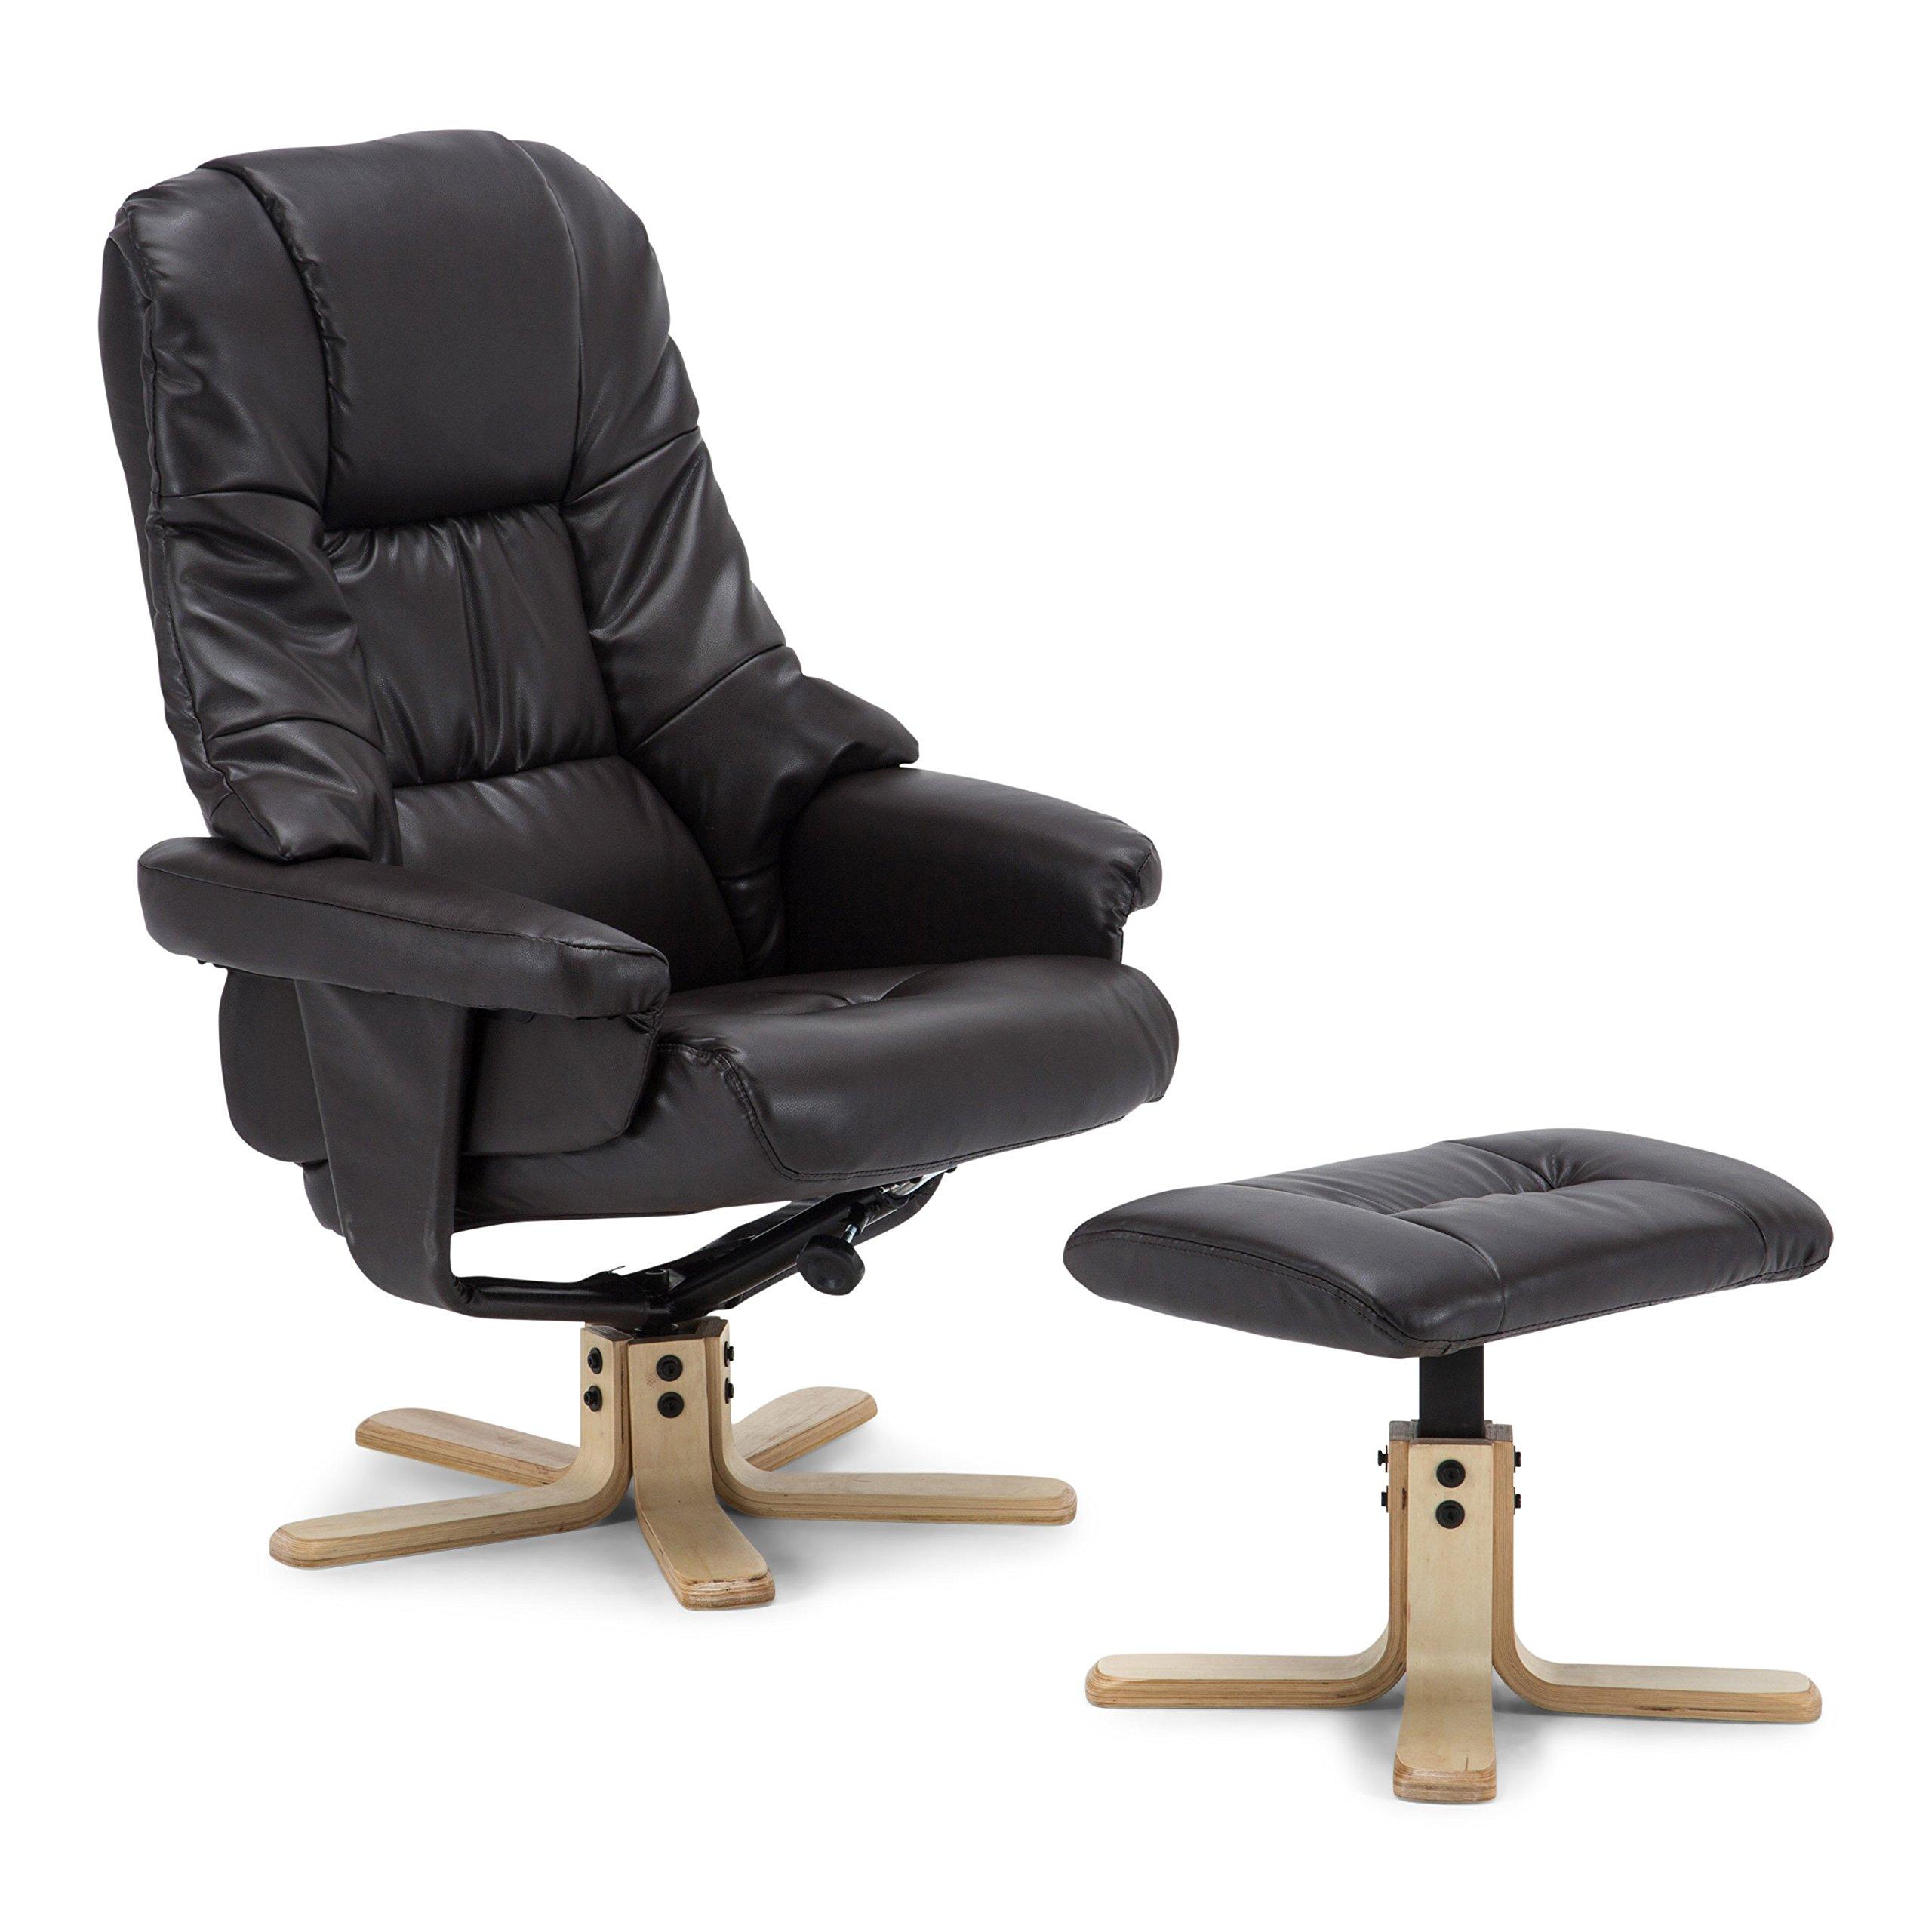 Swivel Chairs for Living Room: Amazon.co.uk